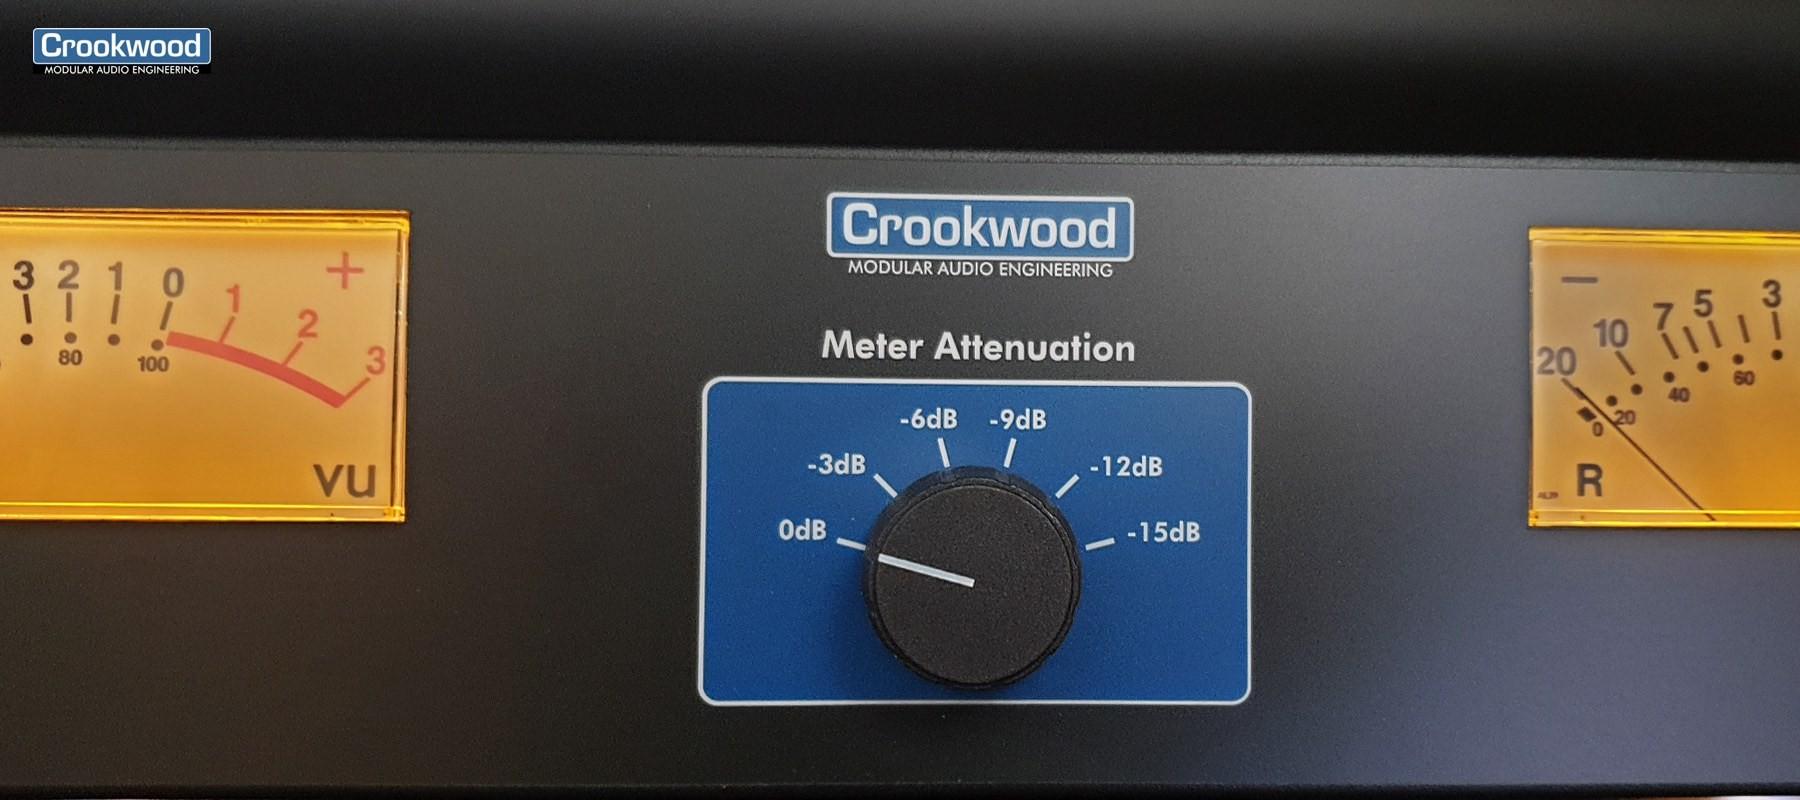 Crookwwod Vu mètre stéréo